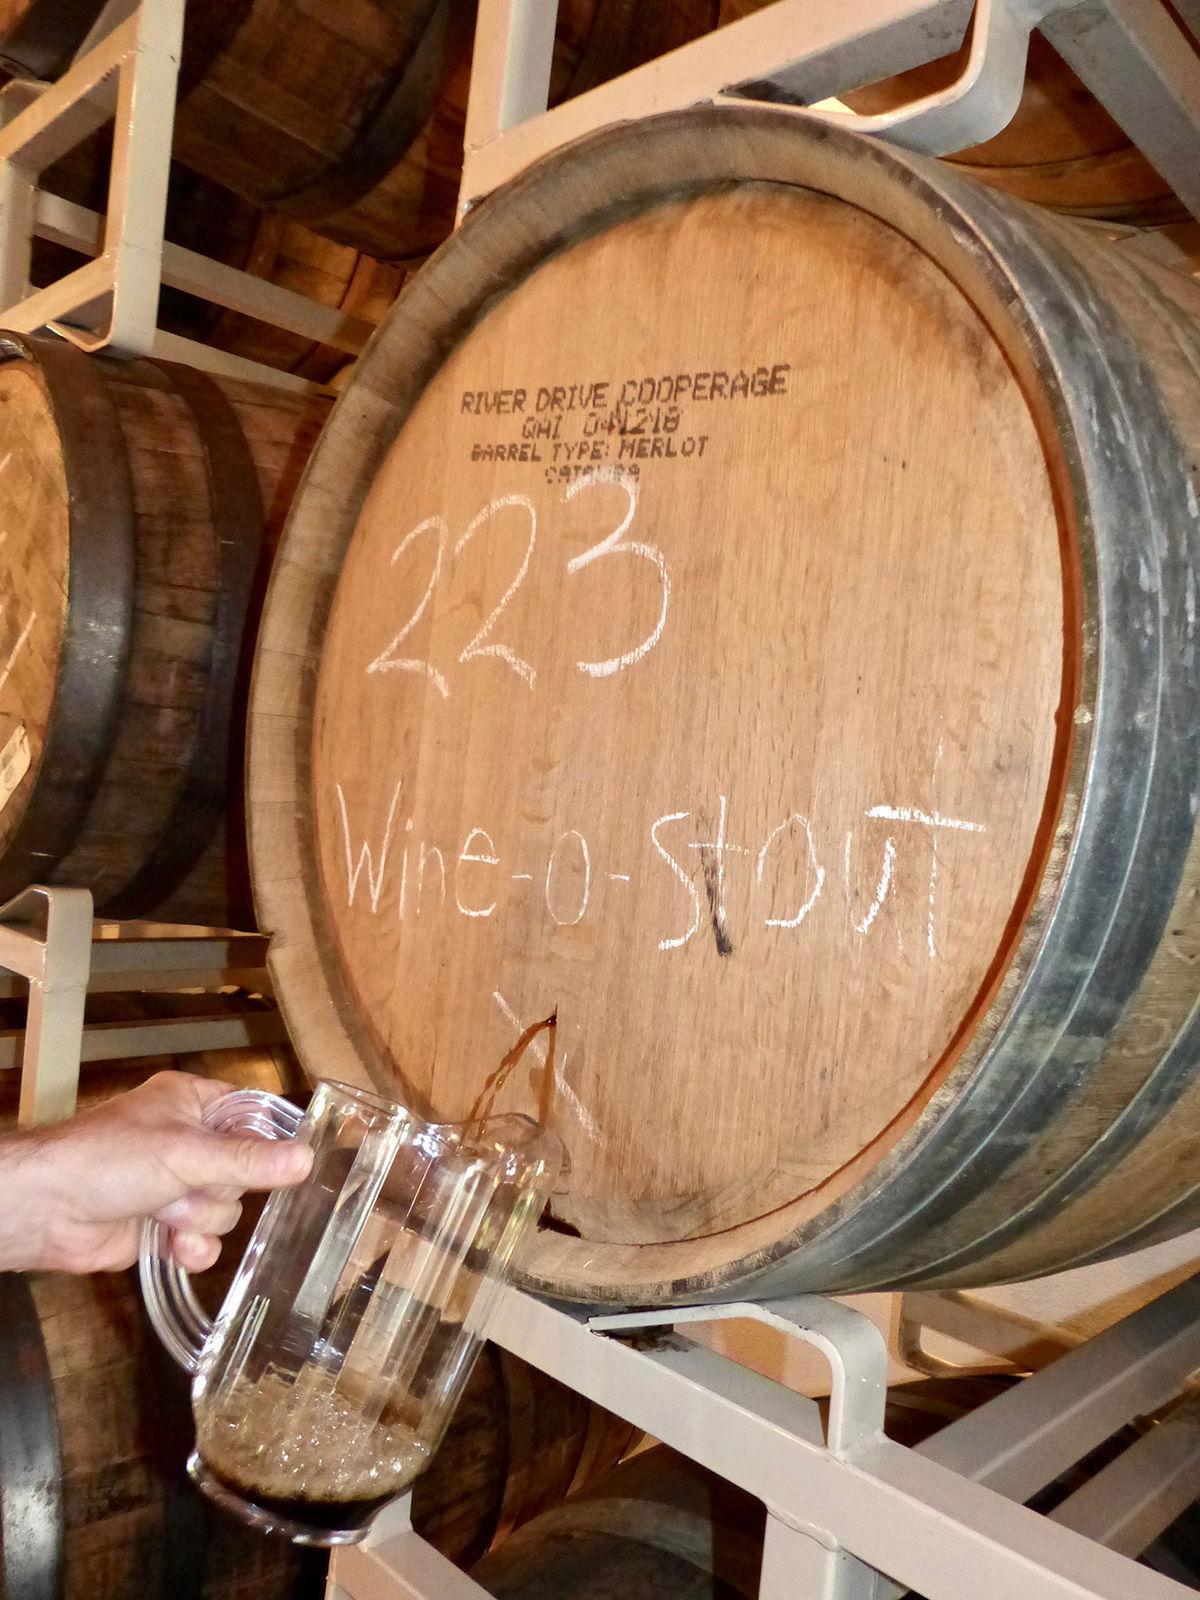 Testing on Catawba's 'Wine-O-Stout,' aged in merlot barrels